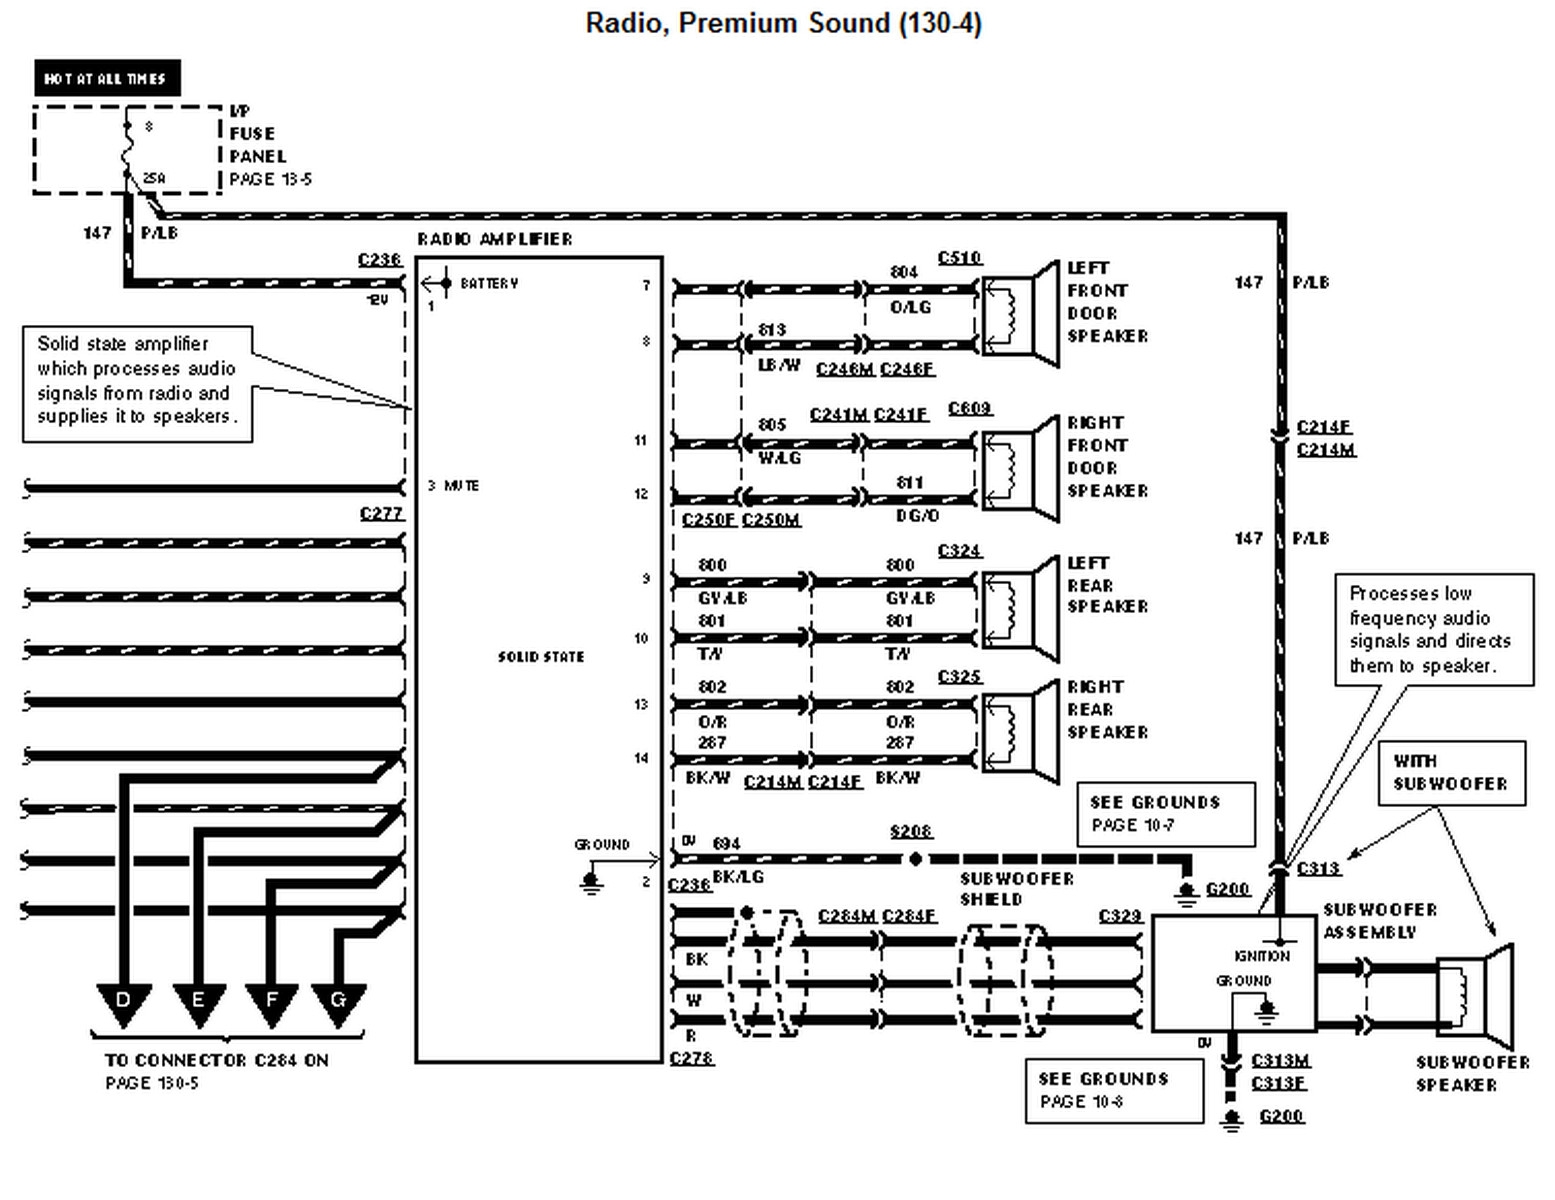 2000 ford F150 Radio Wiring Diagram | Free Wiring Diagram